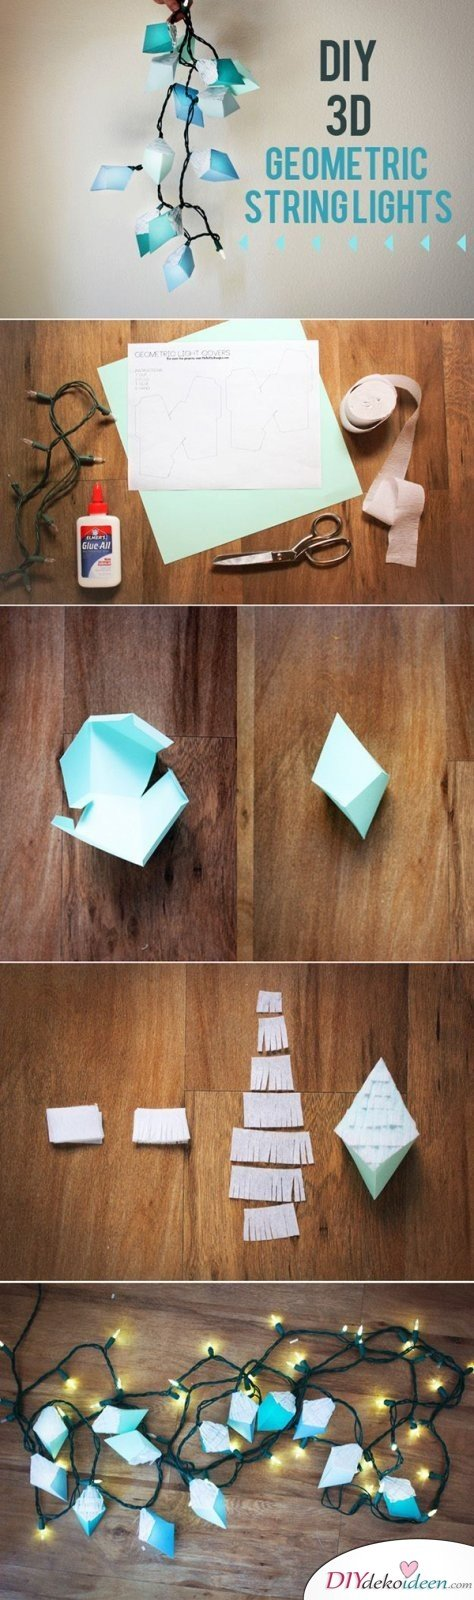 15 Bastelideen DIY Lampen selber machen - DIY geometrische Lichterkette